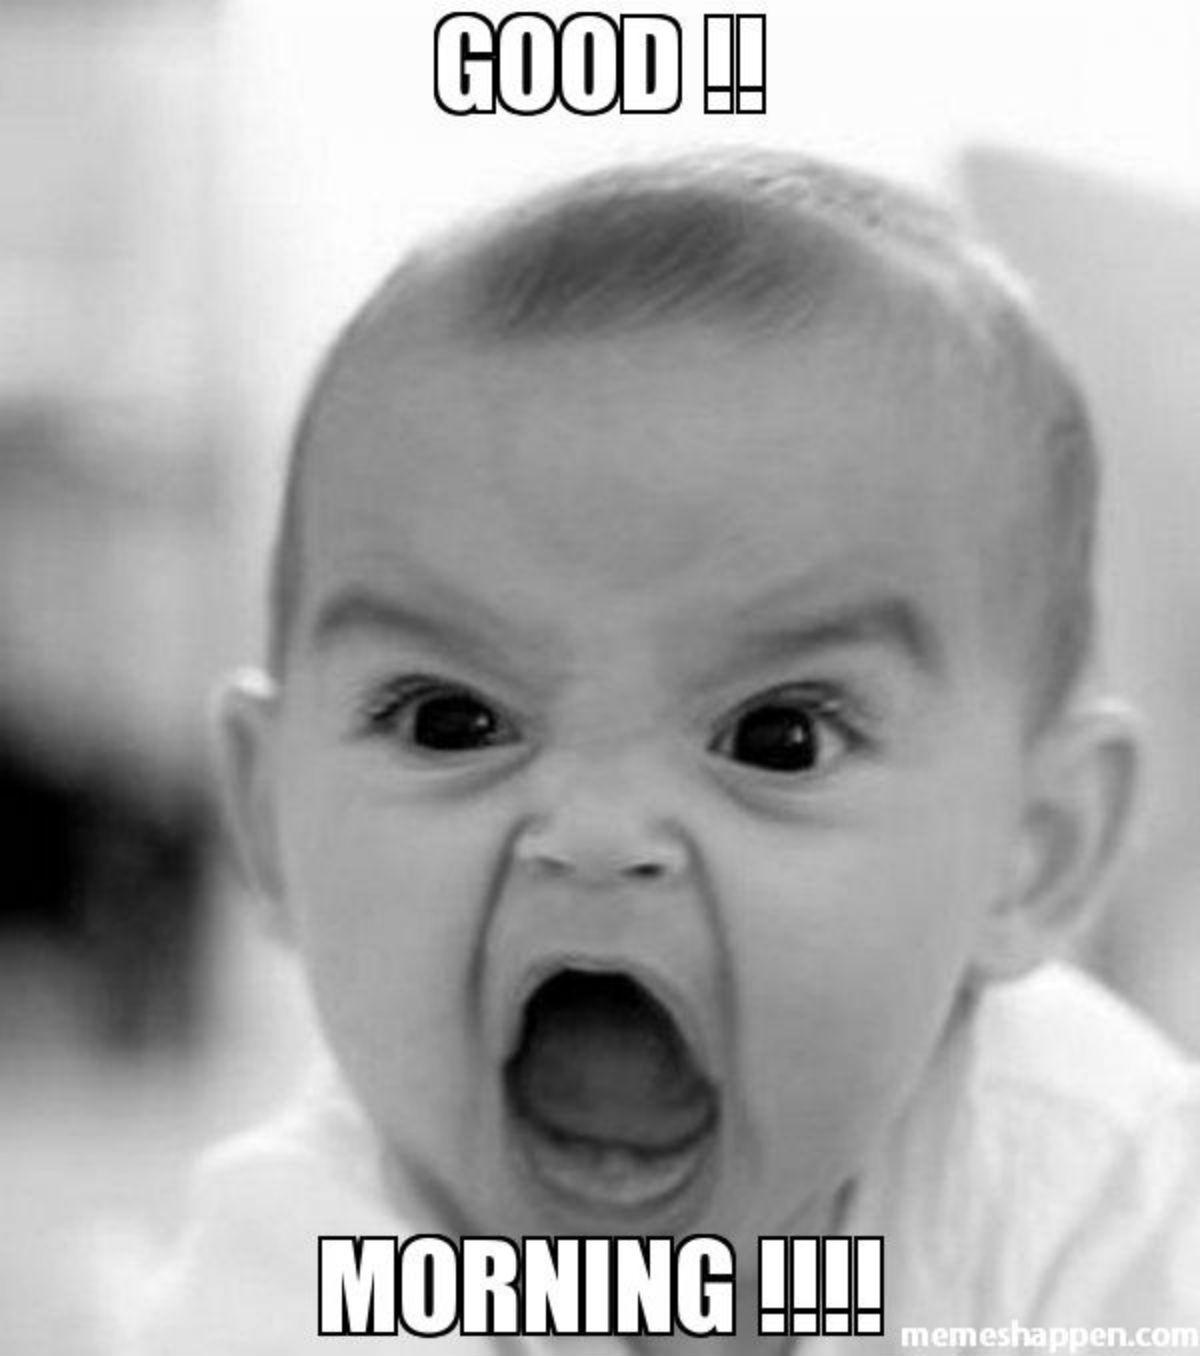 bb97b9c2020658d98b4fa256348115ea funny good morning meme images facebook quotes pinterest